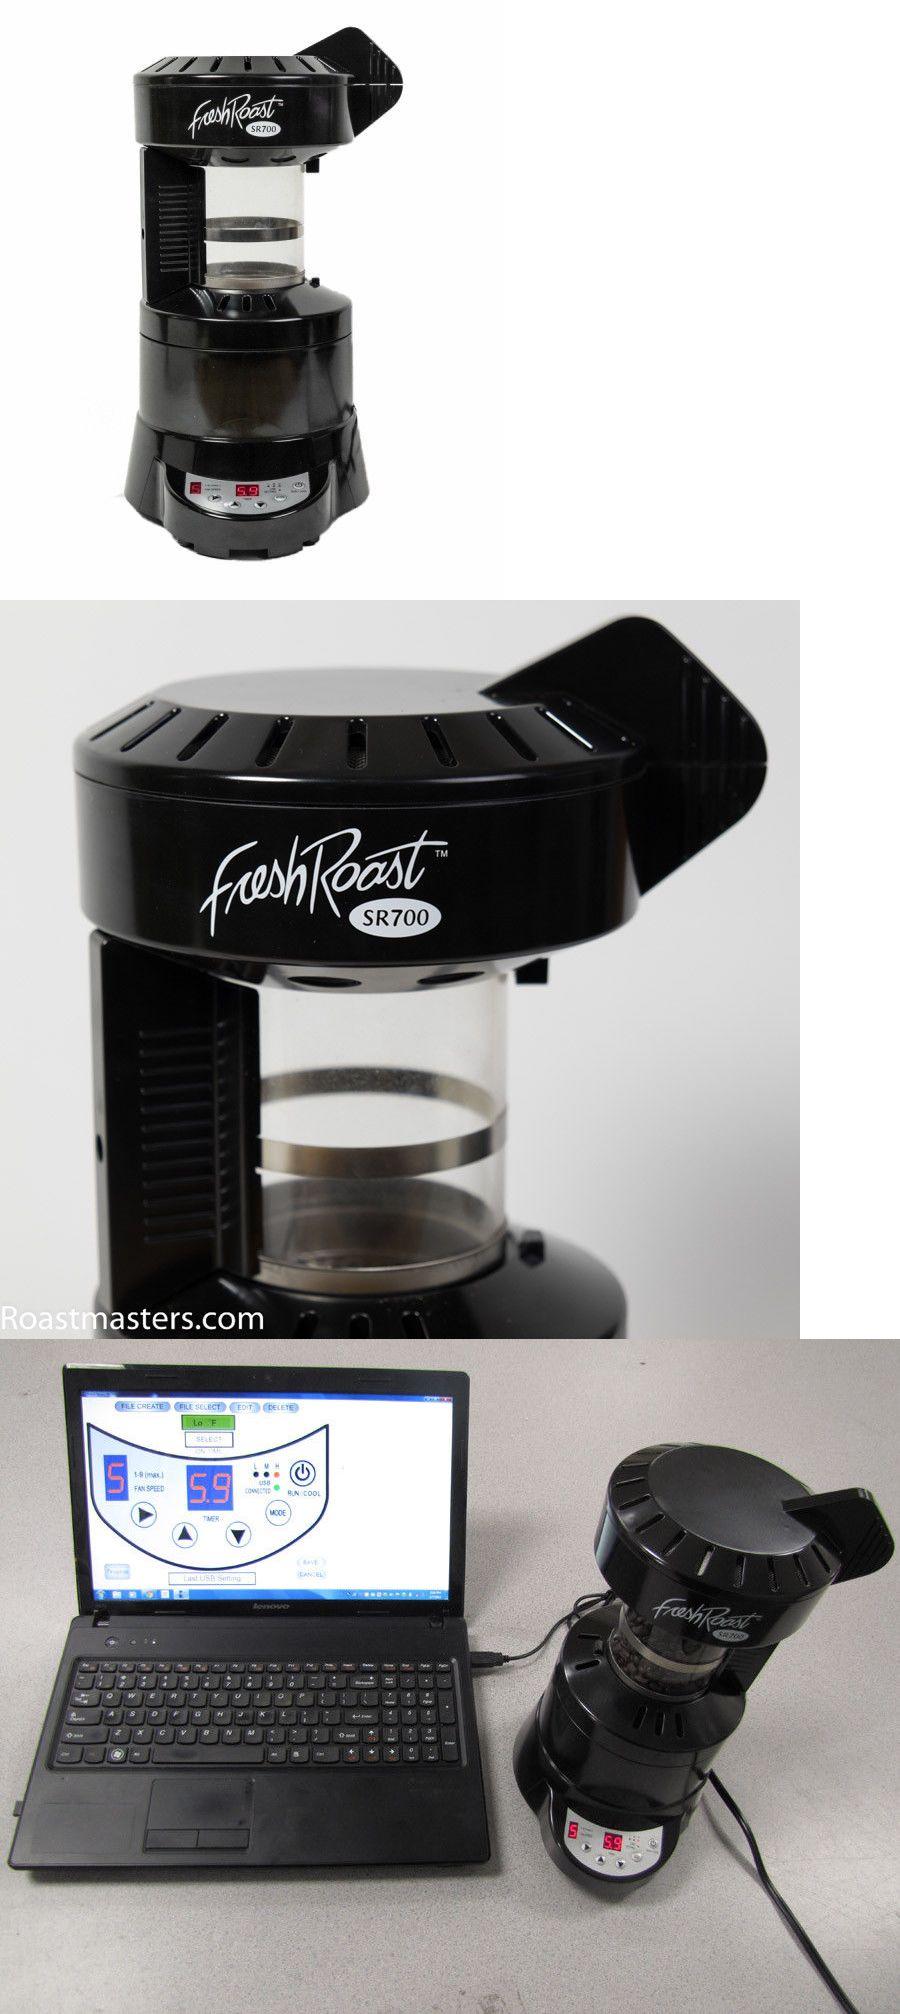 Coffee roasters 177753 fresh roast sr700 home coffee